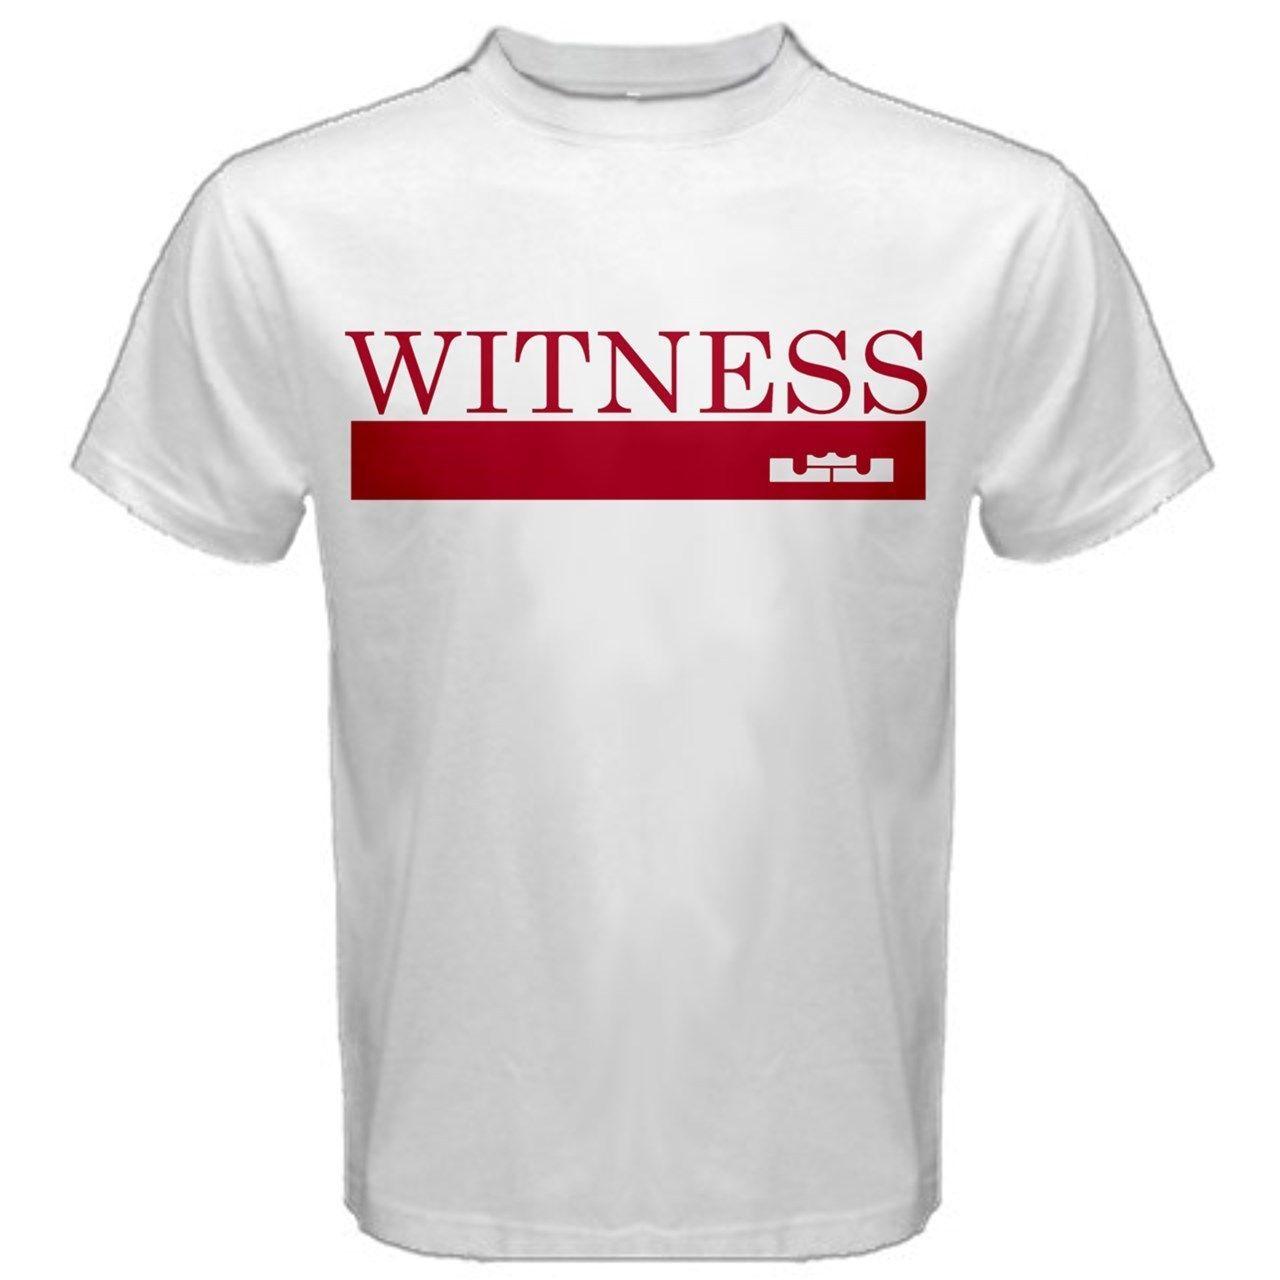 buy online 0be48 bdfce Lebron James King Crown Witness Cavs 23 New T-SHIRT TEES LJ1